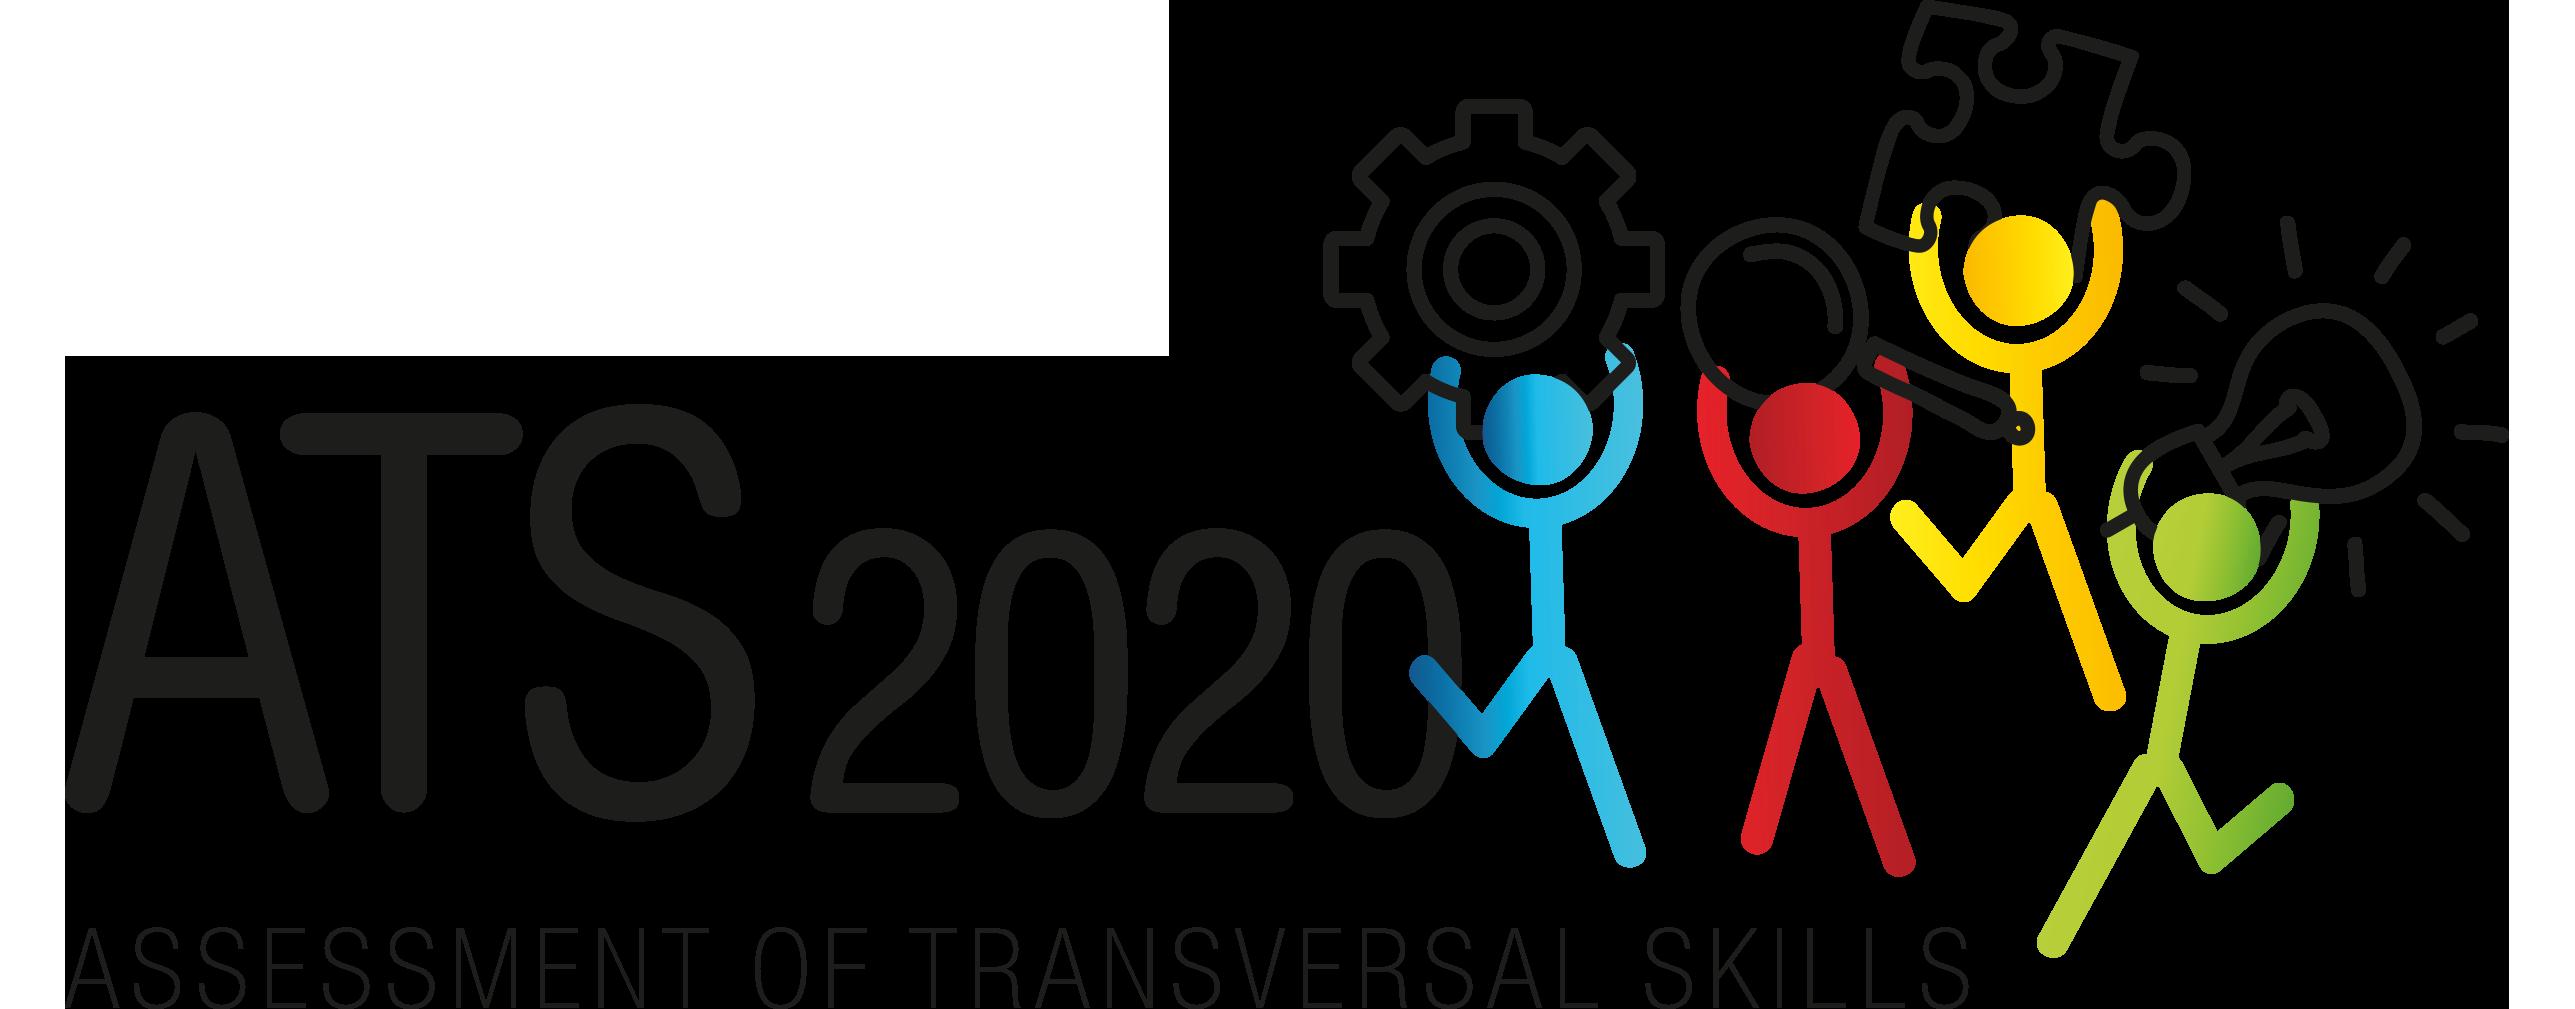 ATS2020_logo_inkl_projekttitel.png